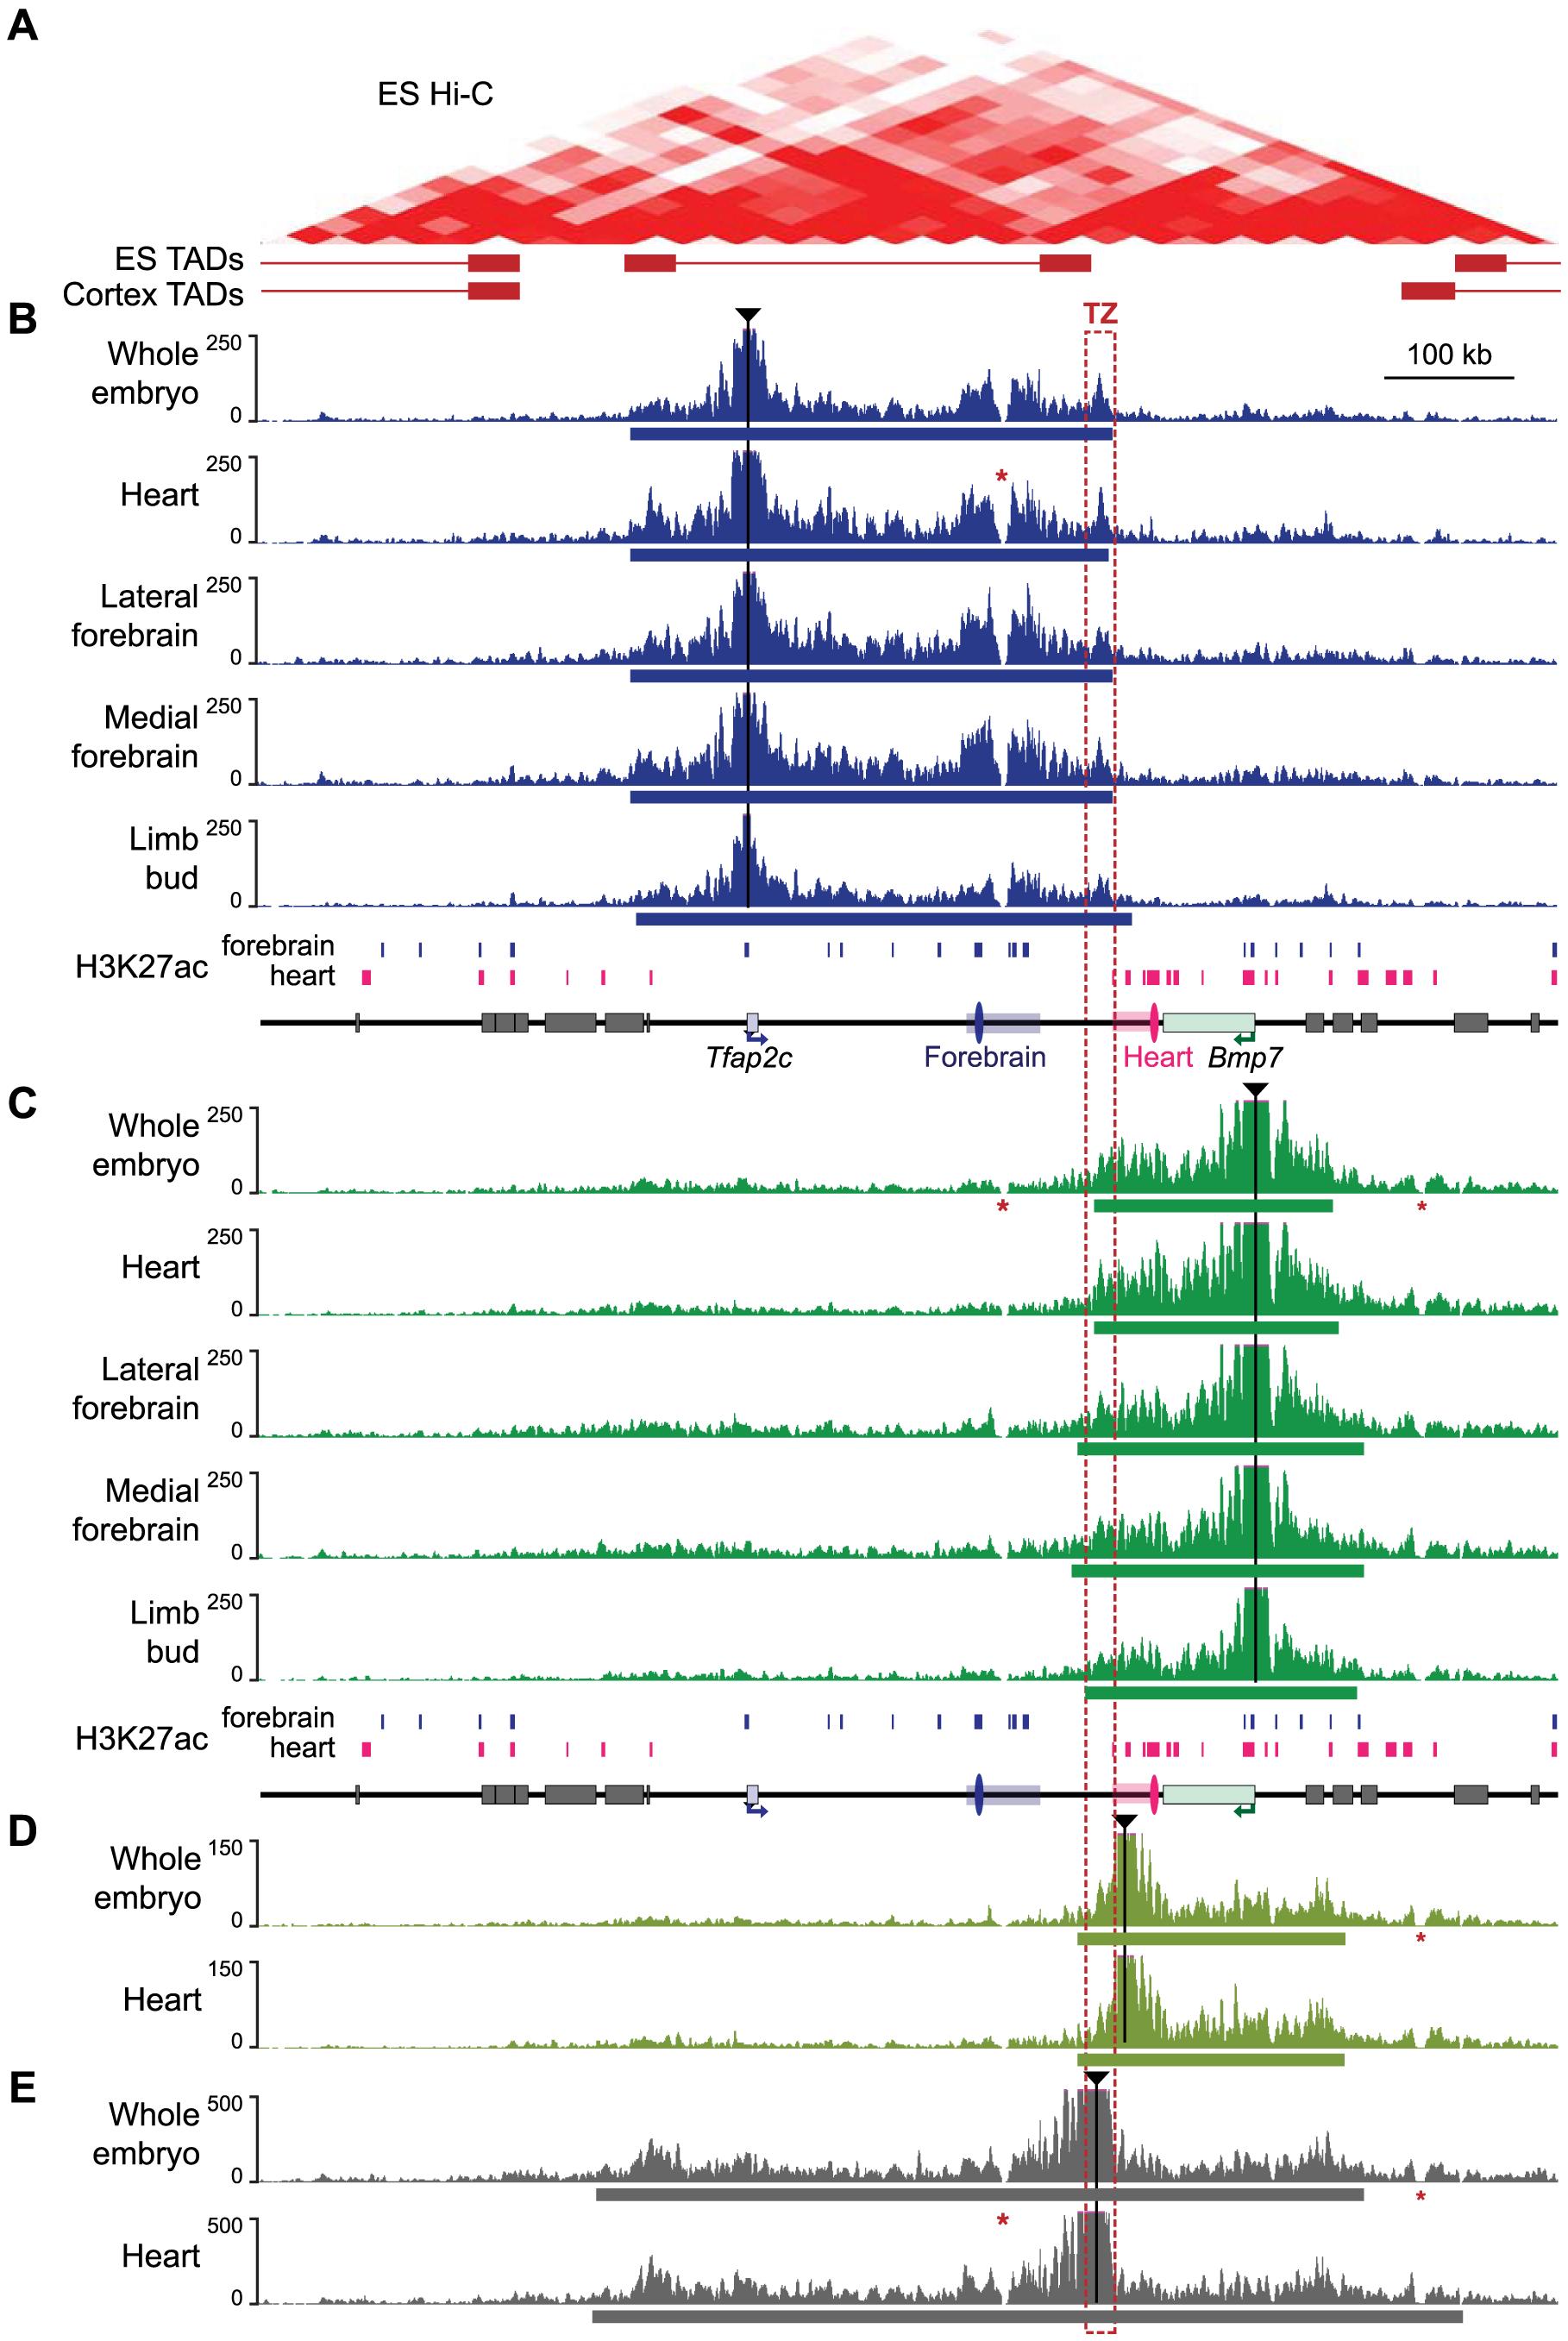 4C profiles describing the conformational structure of the <i>Tfap2c-Bmp7</i> locus.